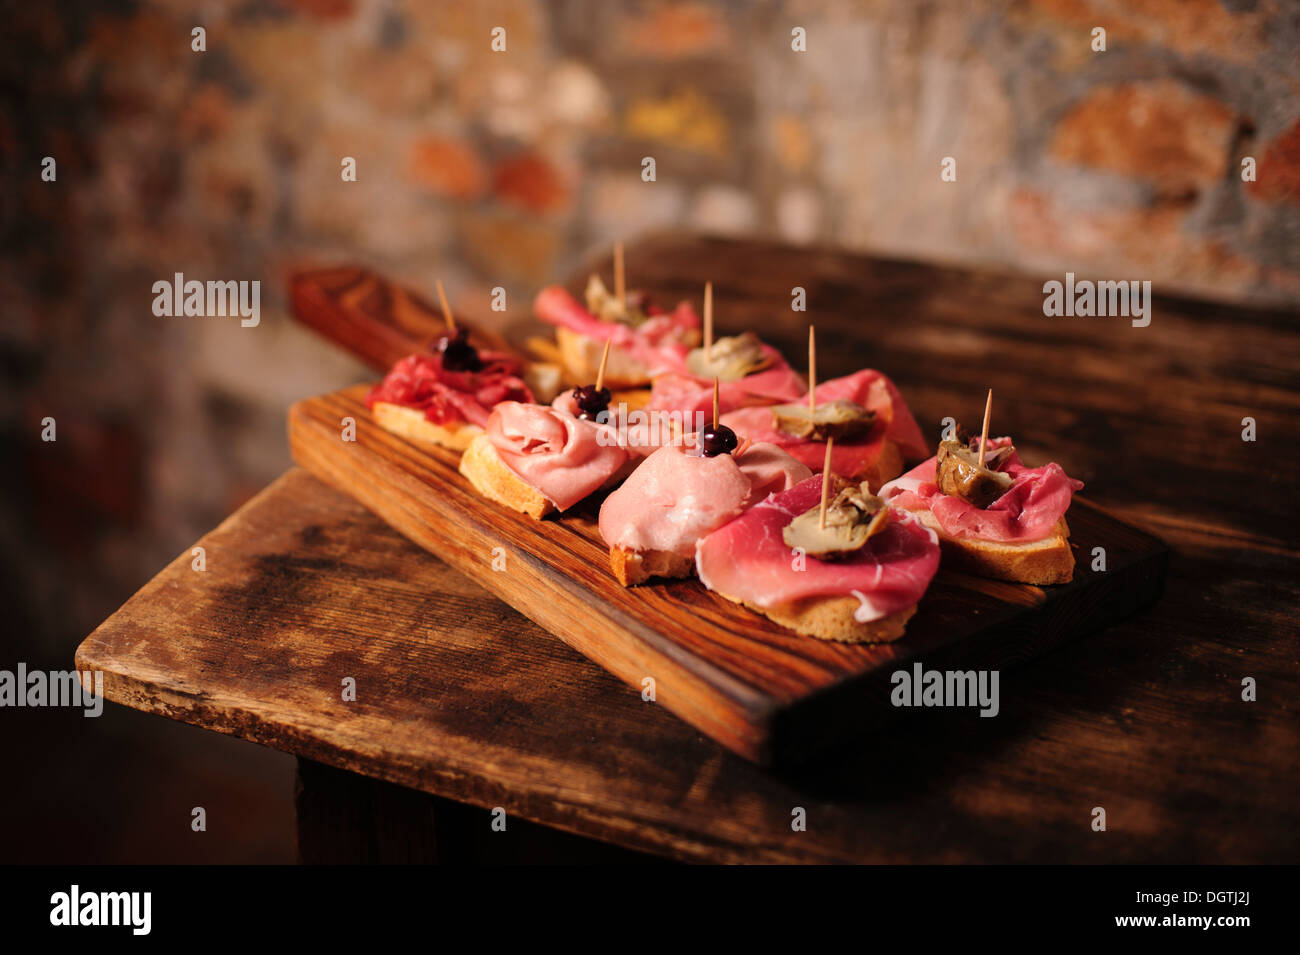 Cured meats Cicchetti appetizers at La Mascareta Restaurant, Venice, Italy. Stock Photo